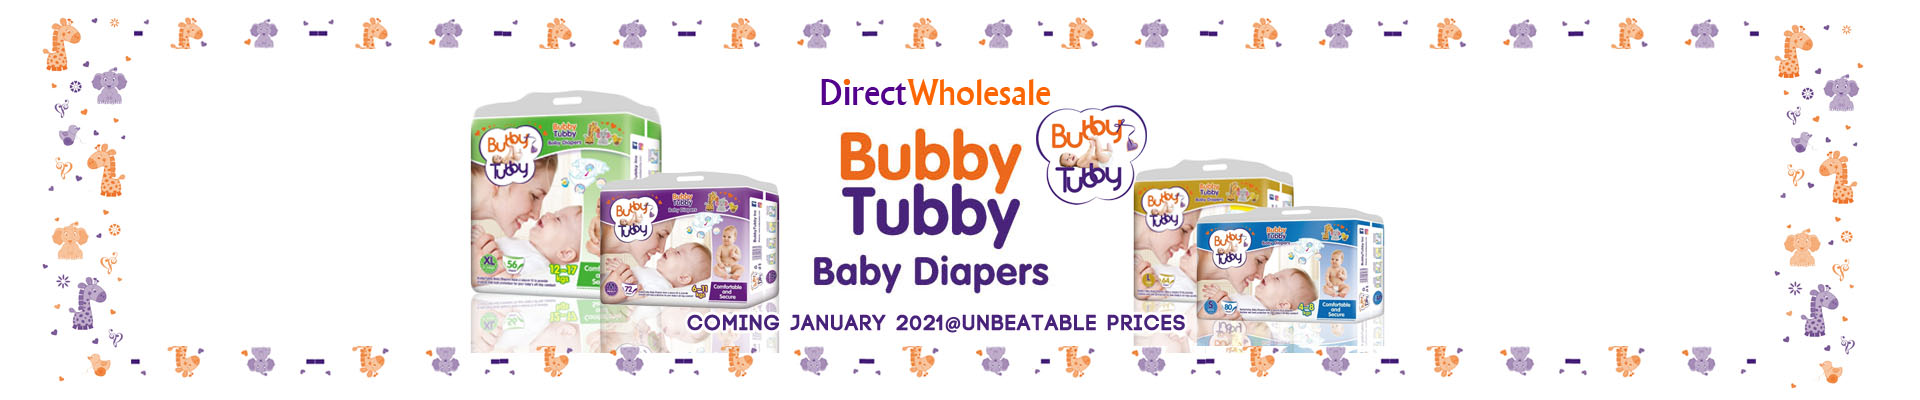 DW Bubby Tubby